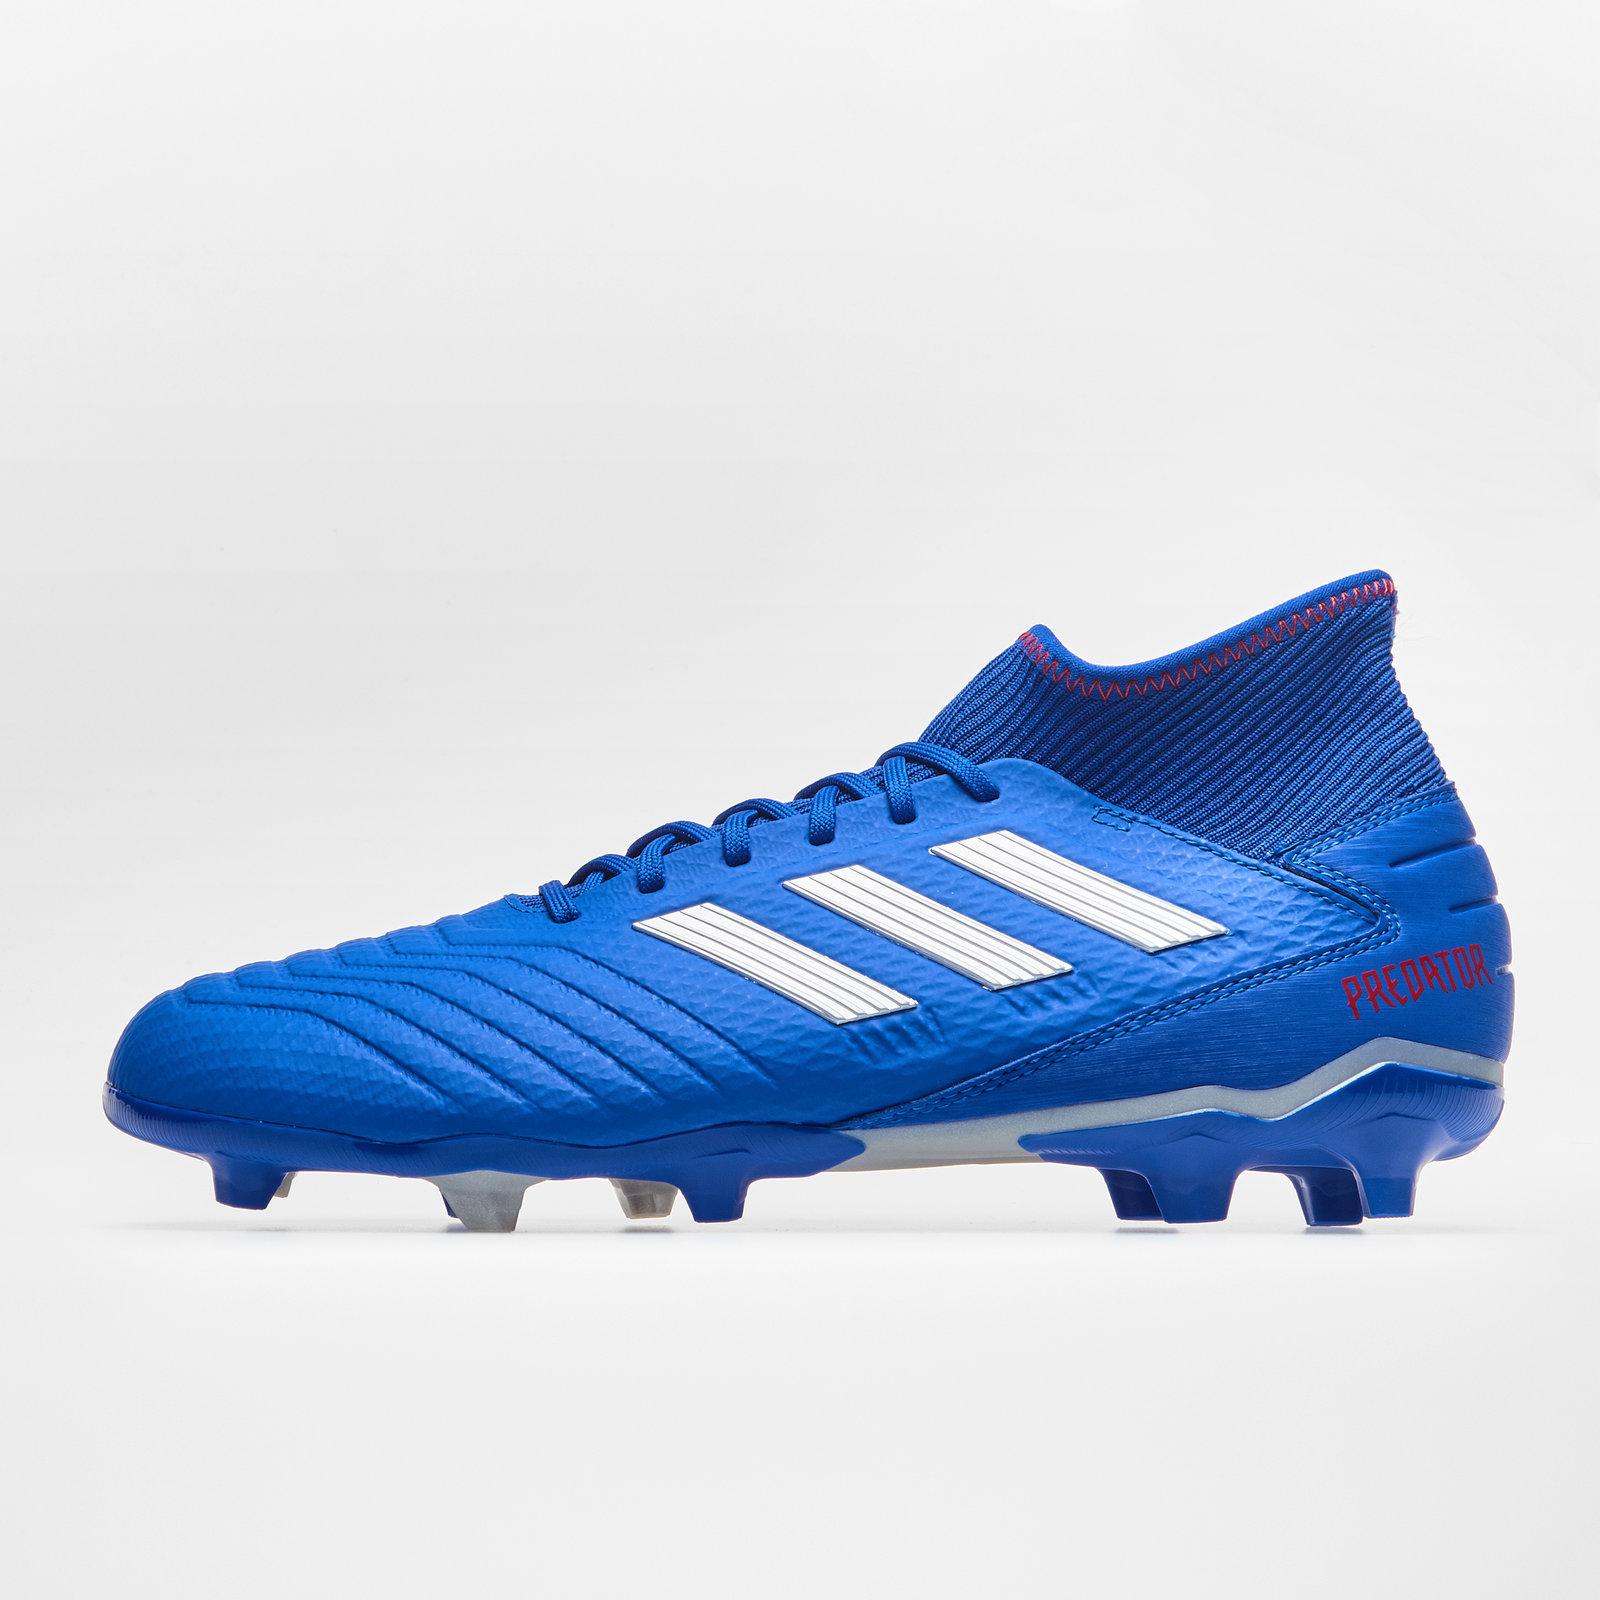 71d8426c2 adidas Predator Football Boots